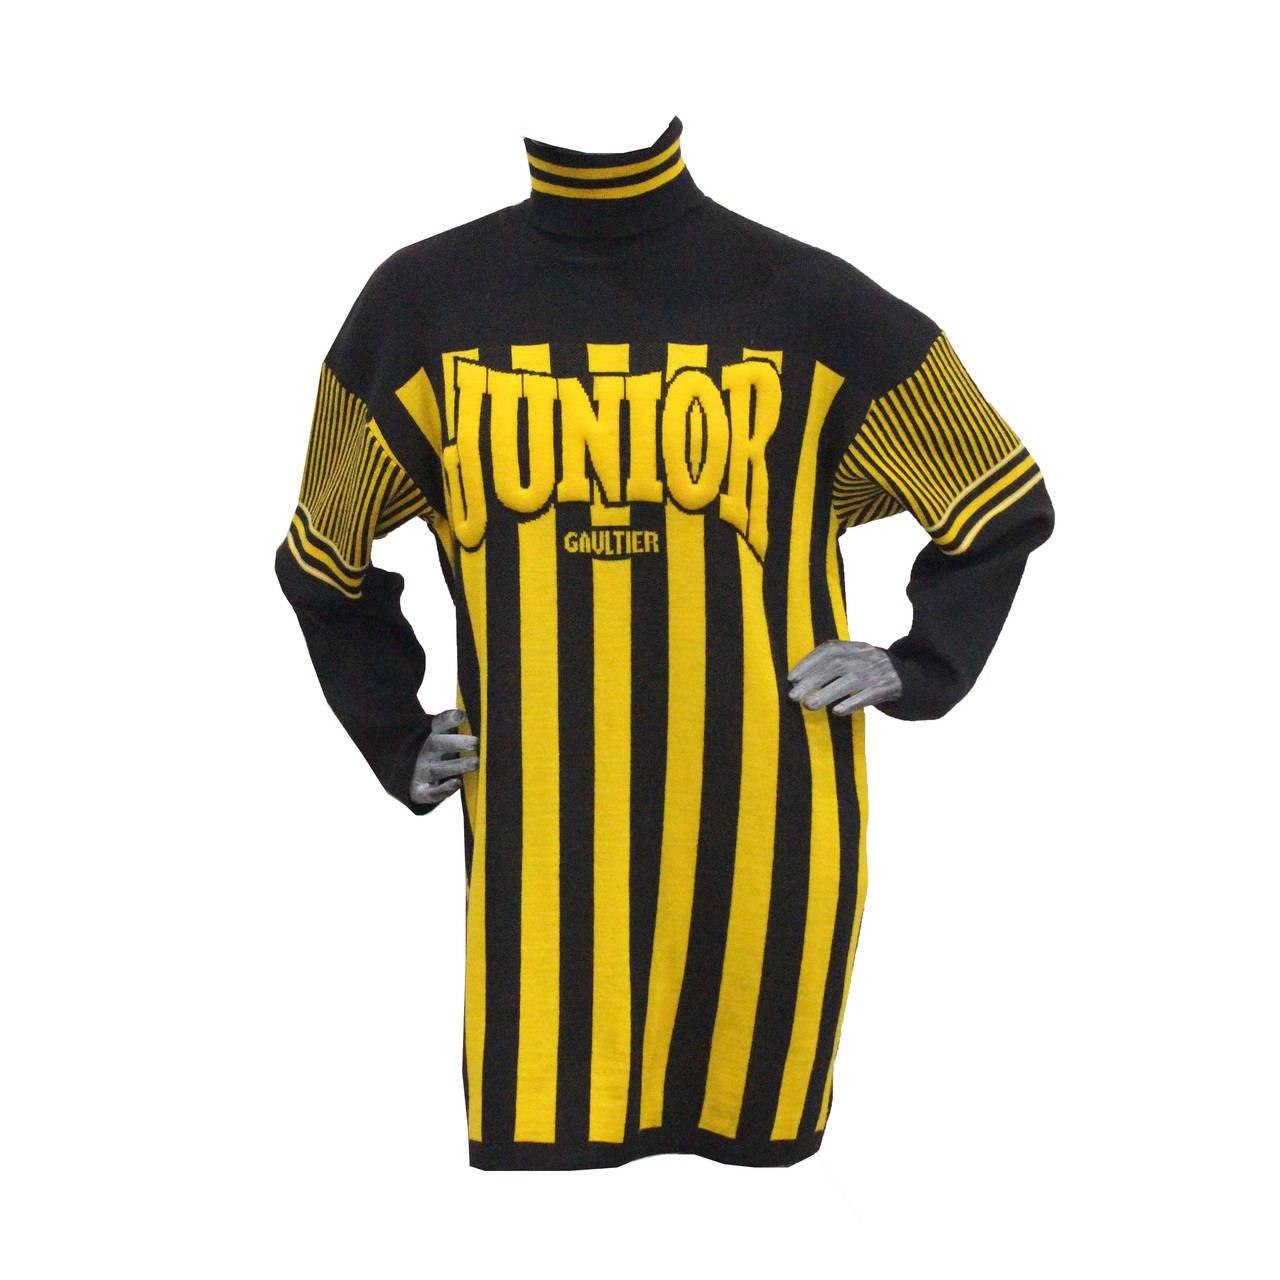 A rare 1980s Jean Paul Gaultier Football Knitted Sweater Dress